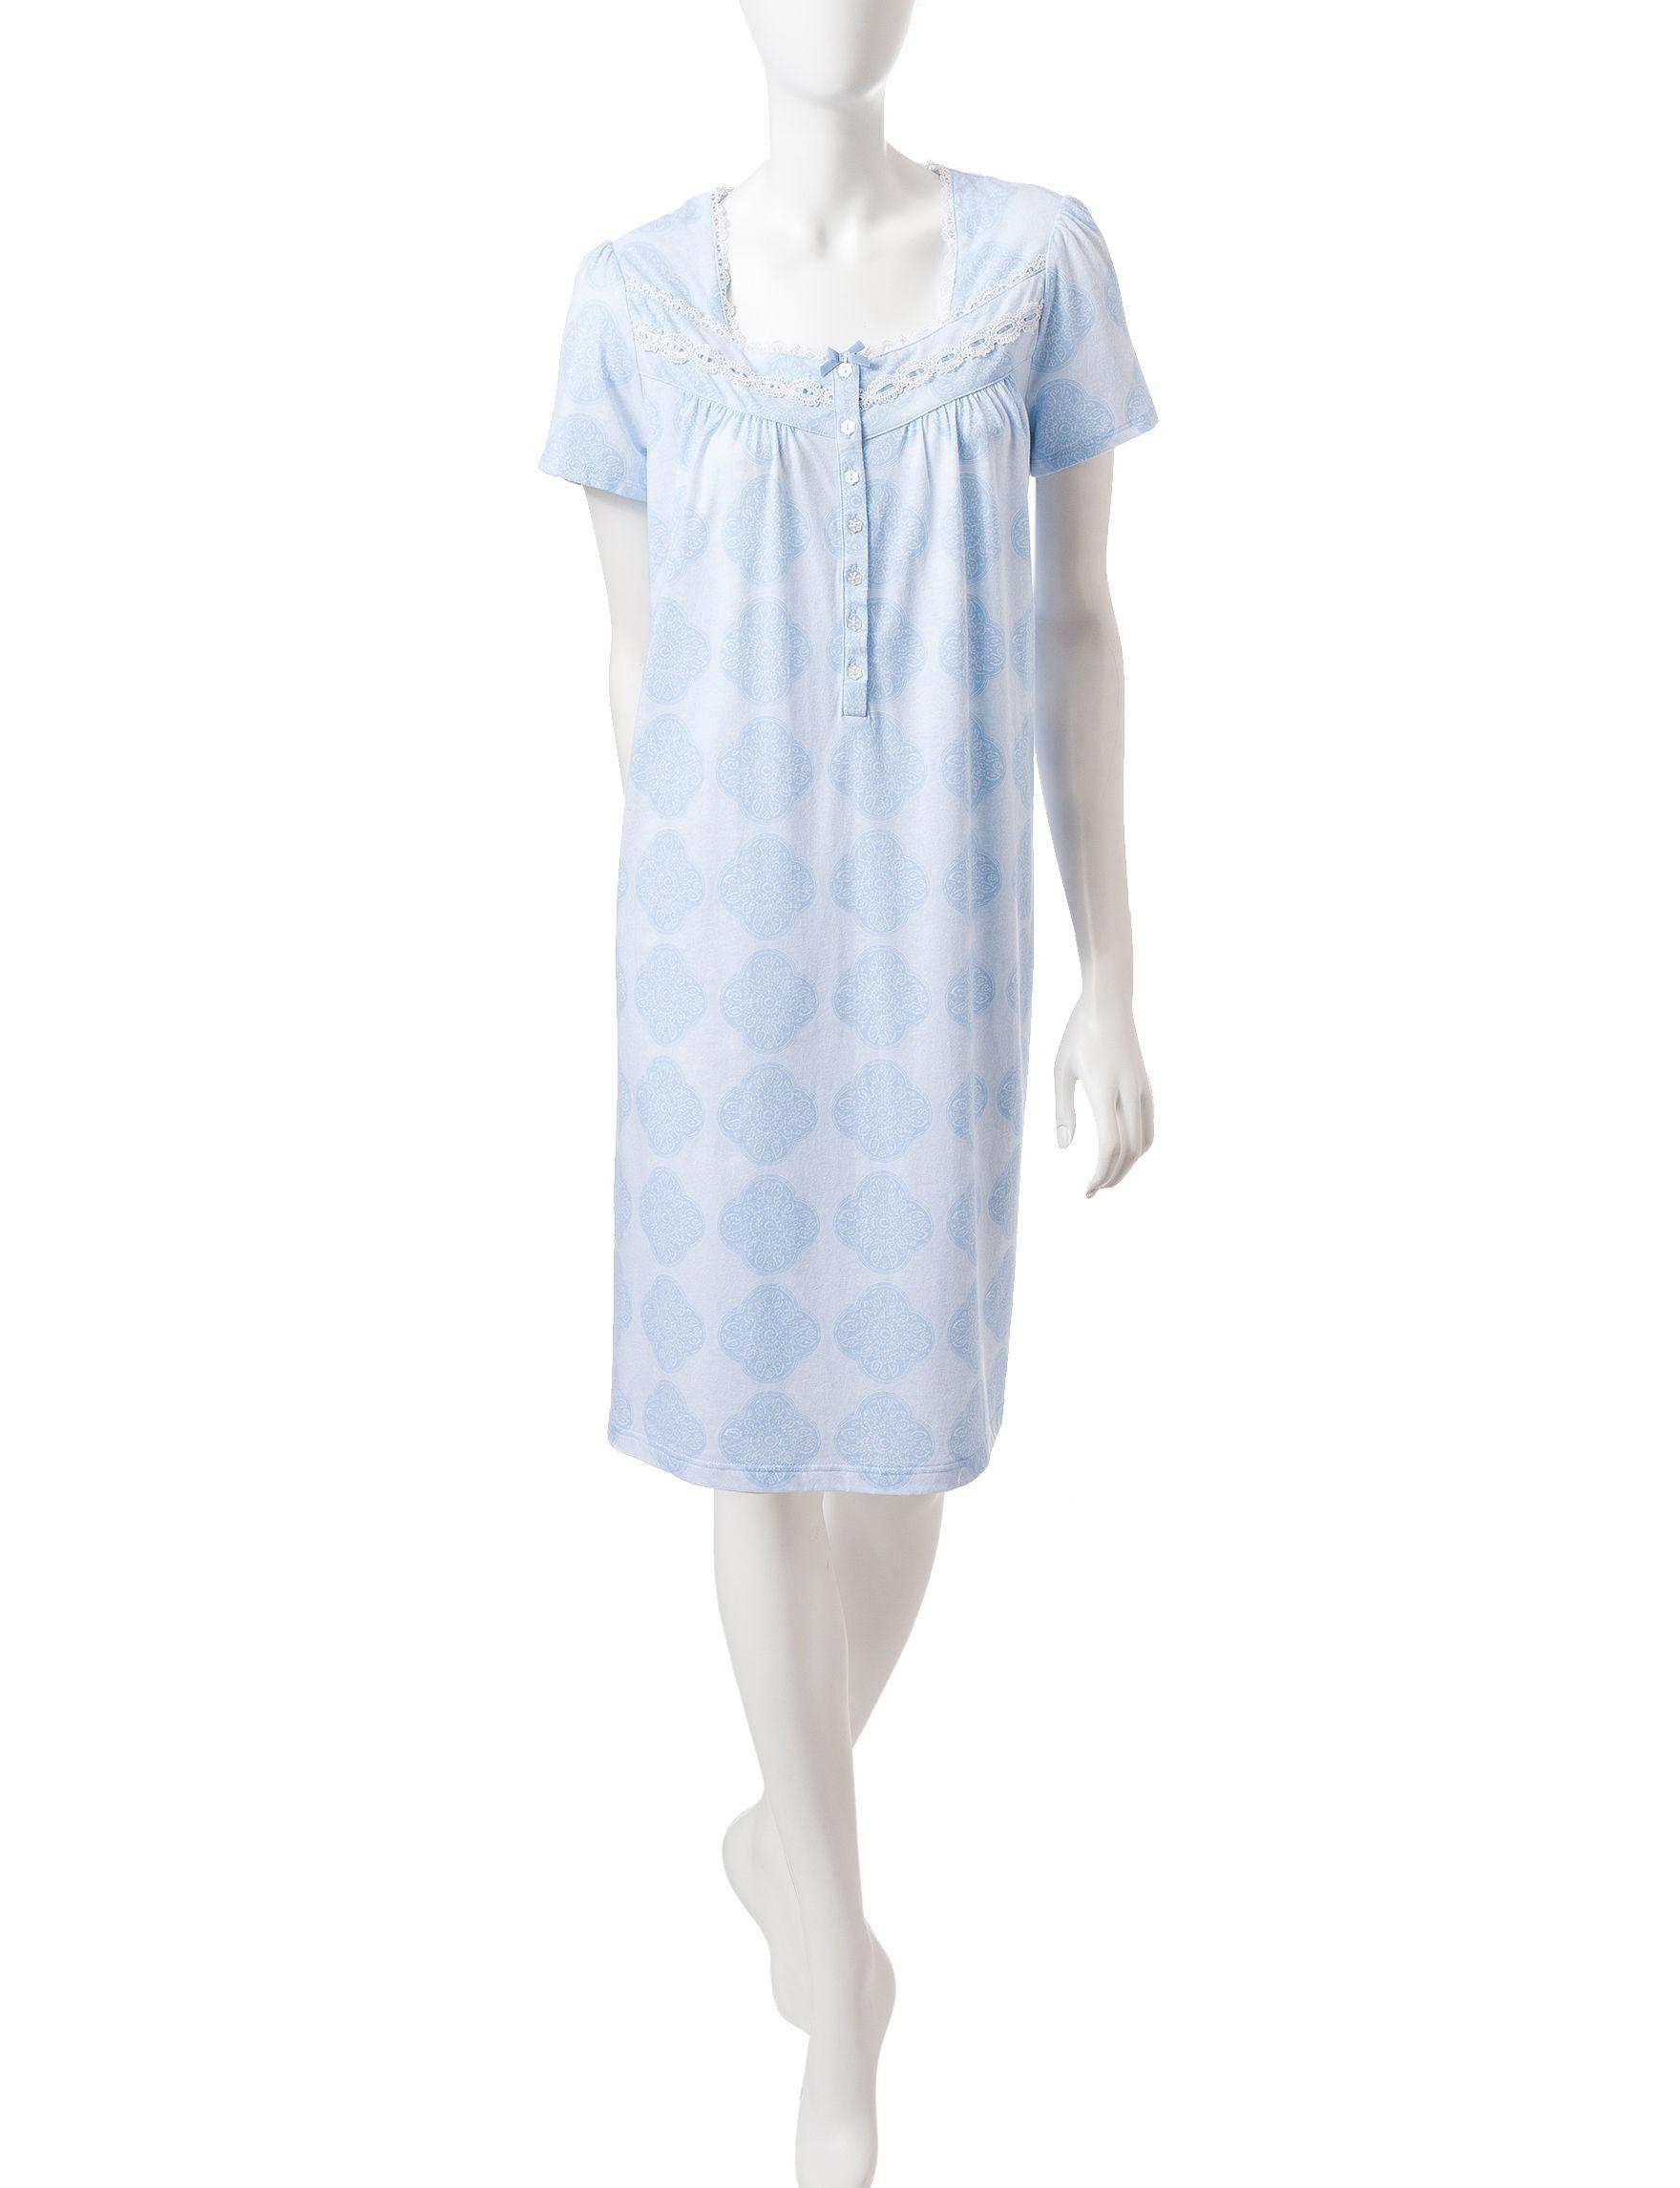 Jasmine Rose Blue House Dresses